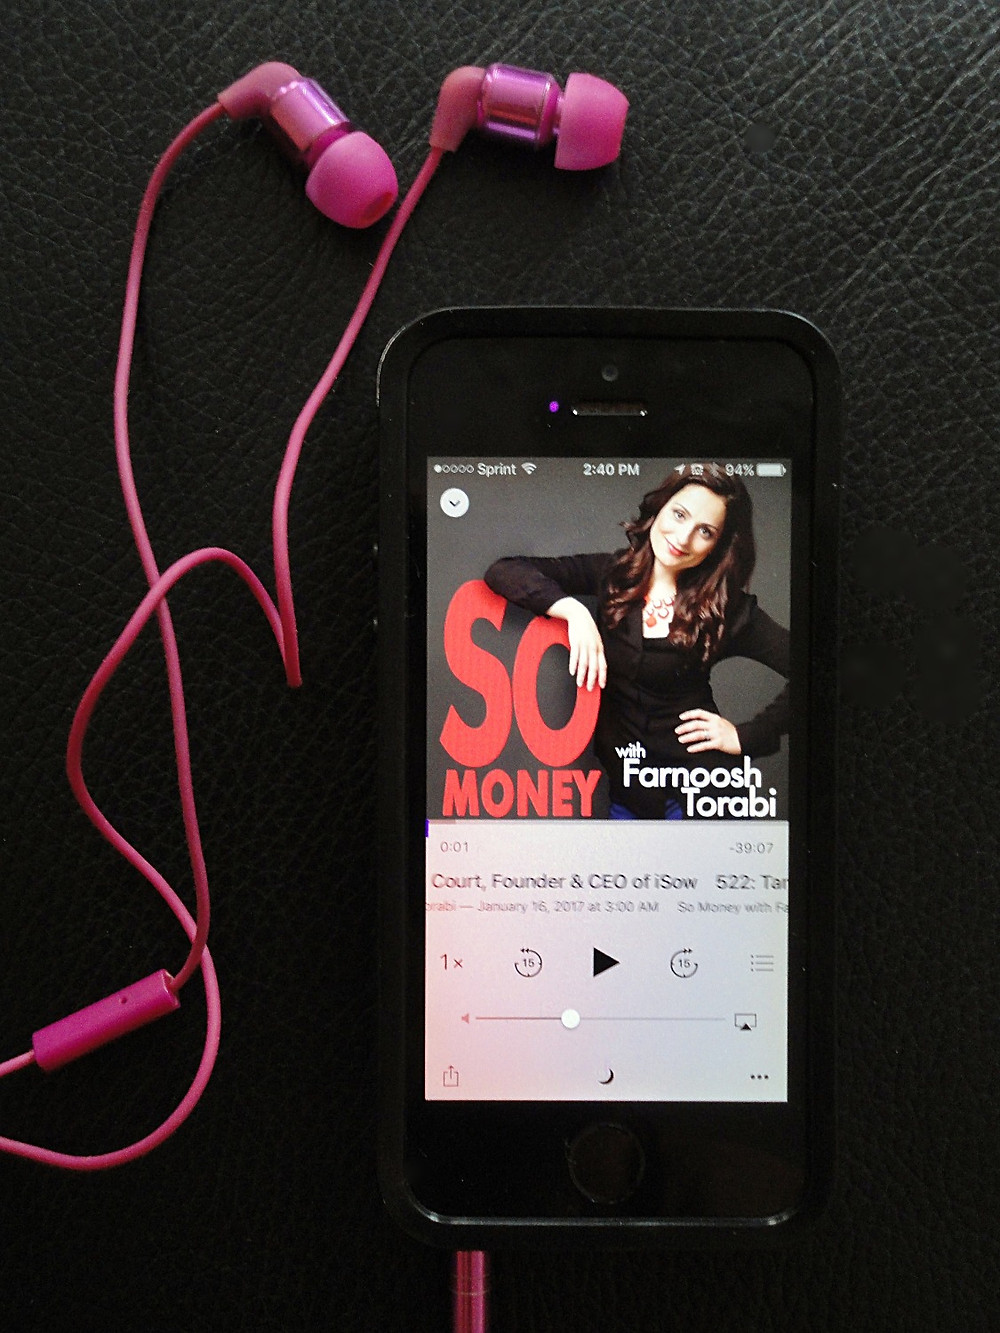 So Money by Farnoosh Torabi